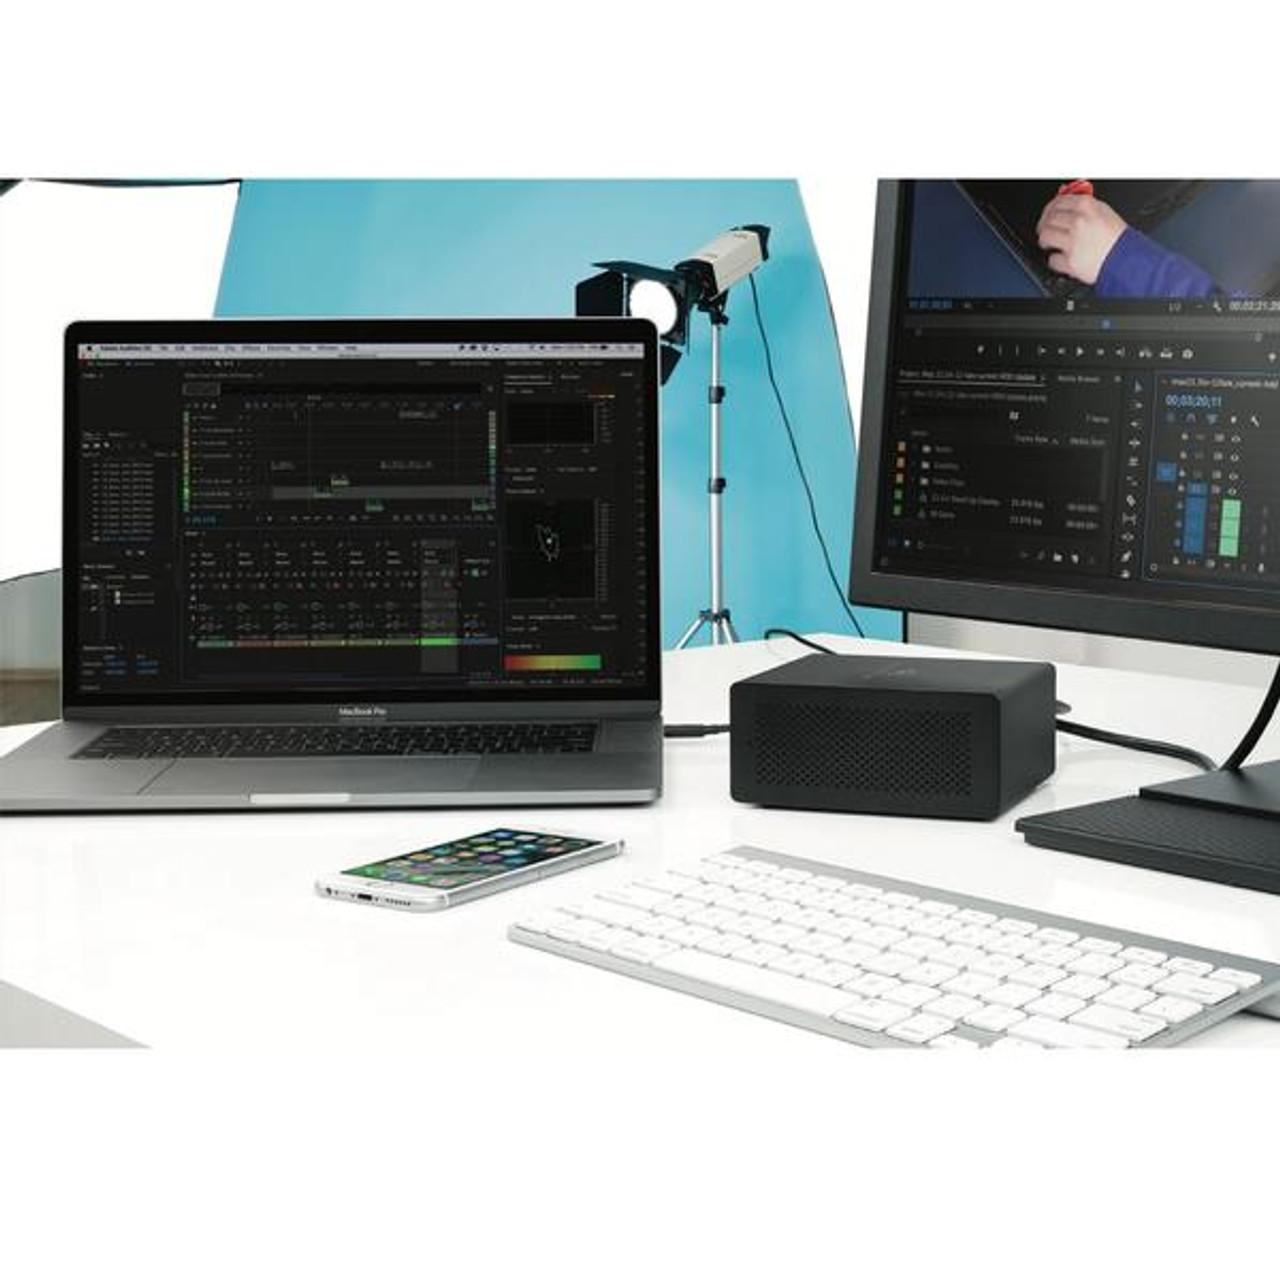 OWC Express 4M2 Enclosure for 4 x M2 SSD with SoftRAID XT Lite